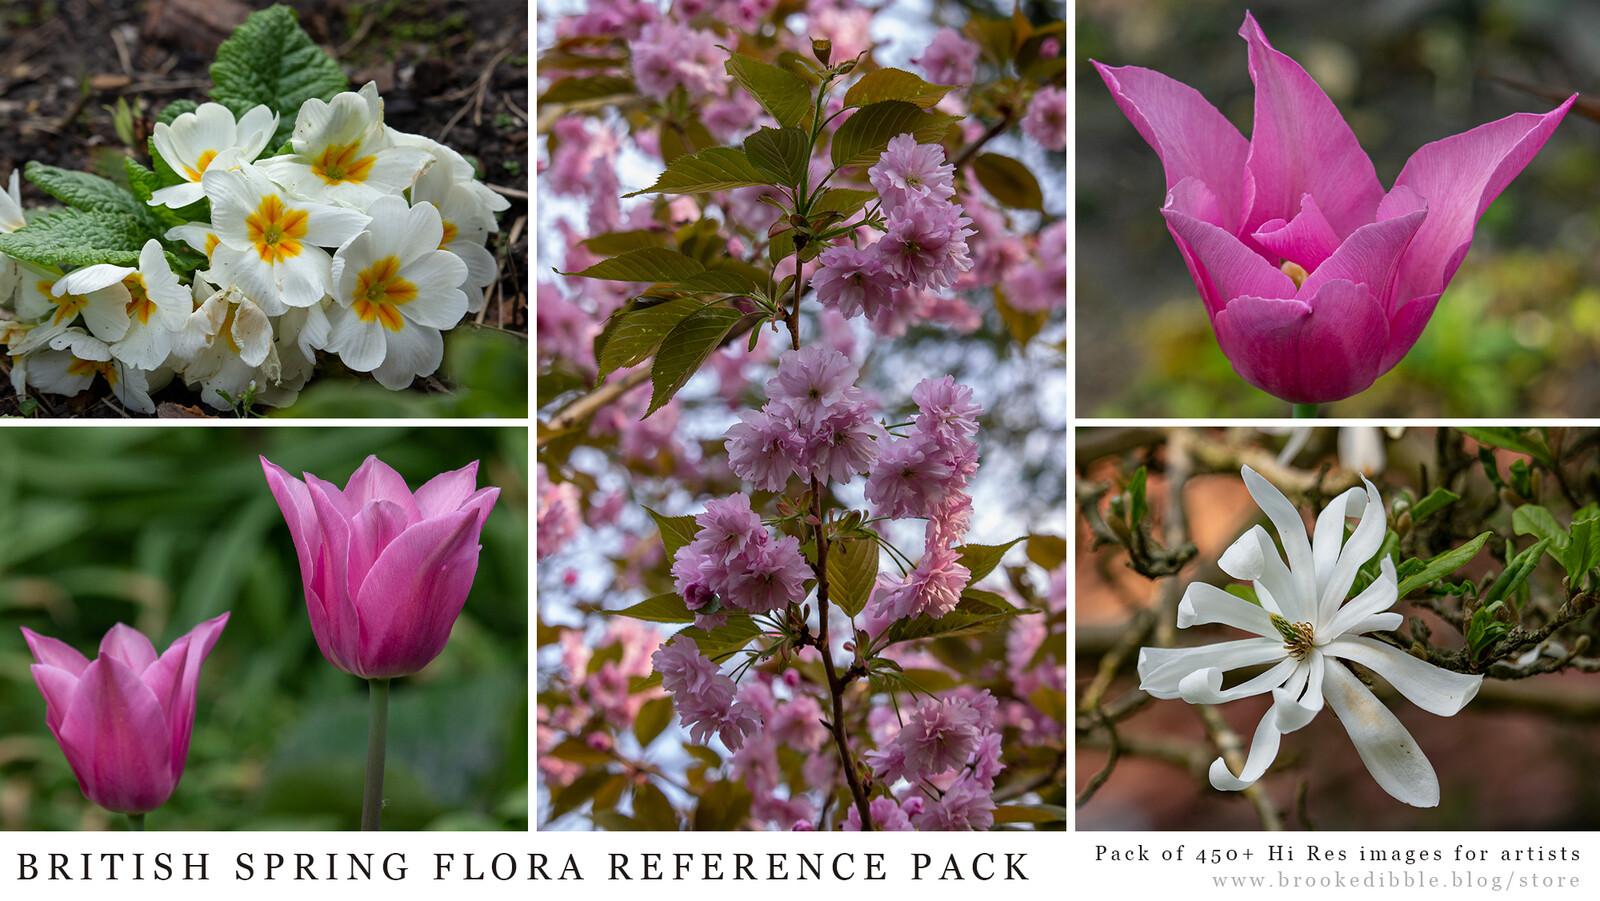 British Spring Flora reference pack